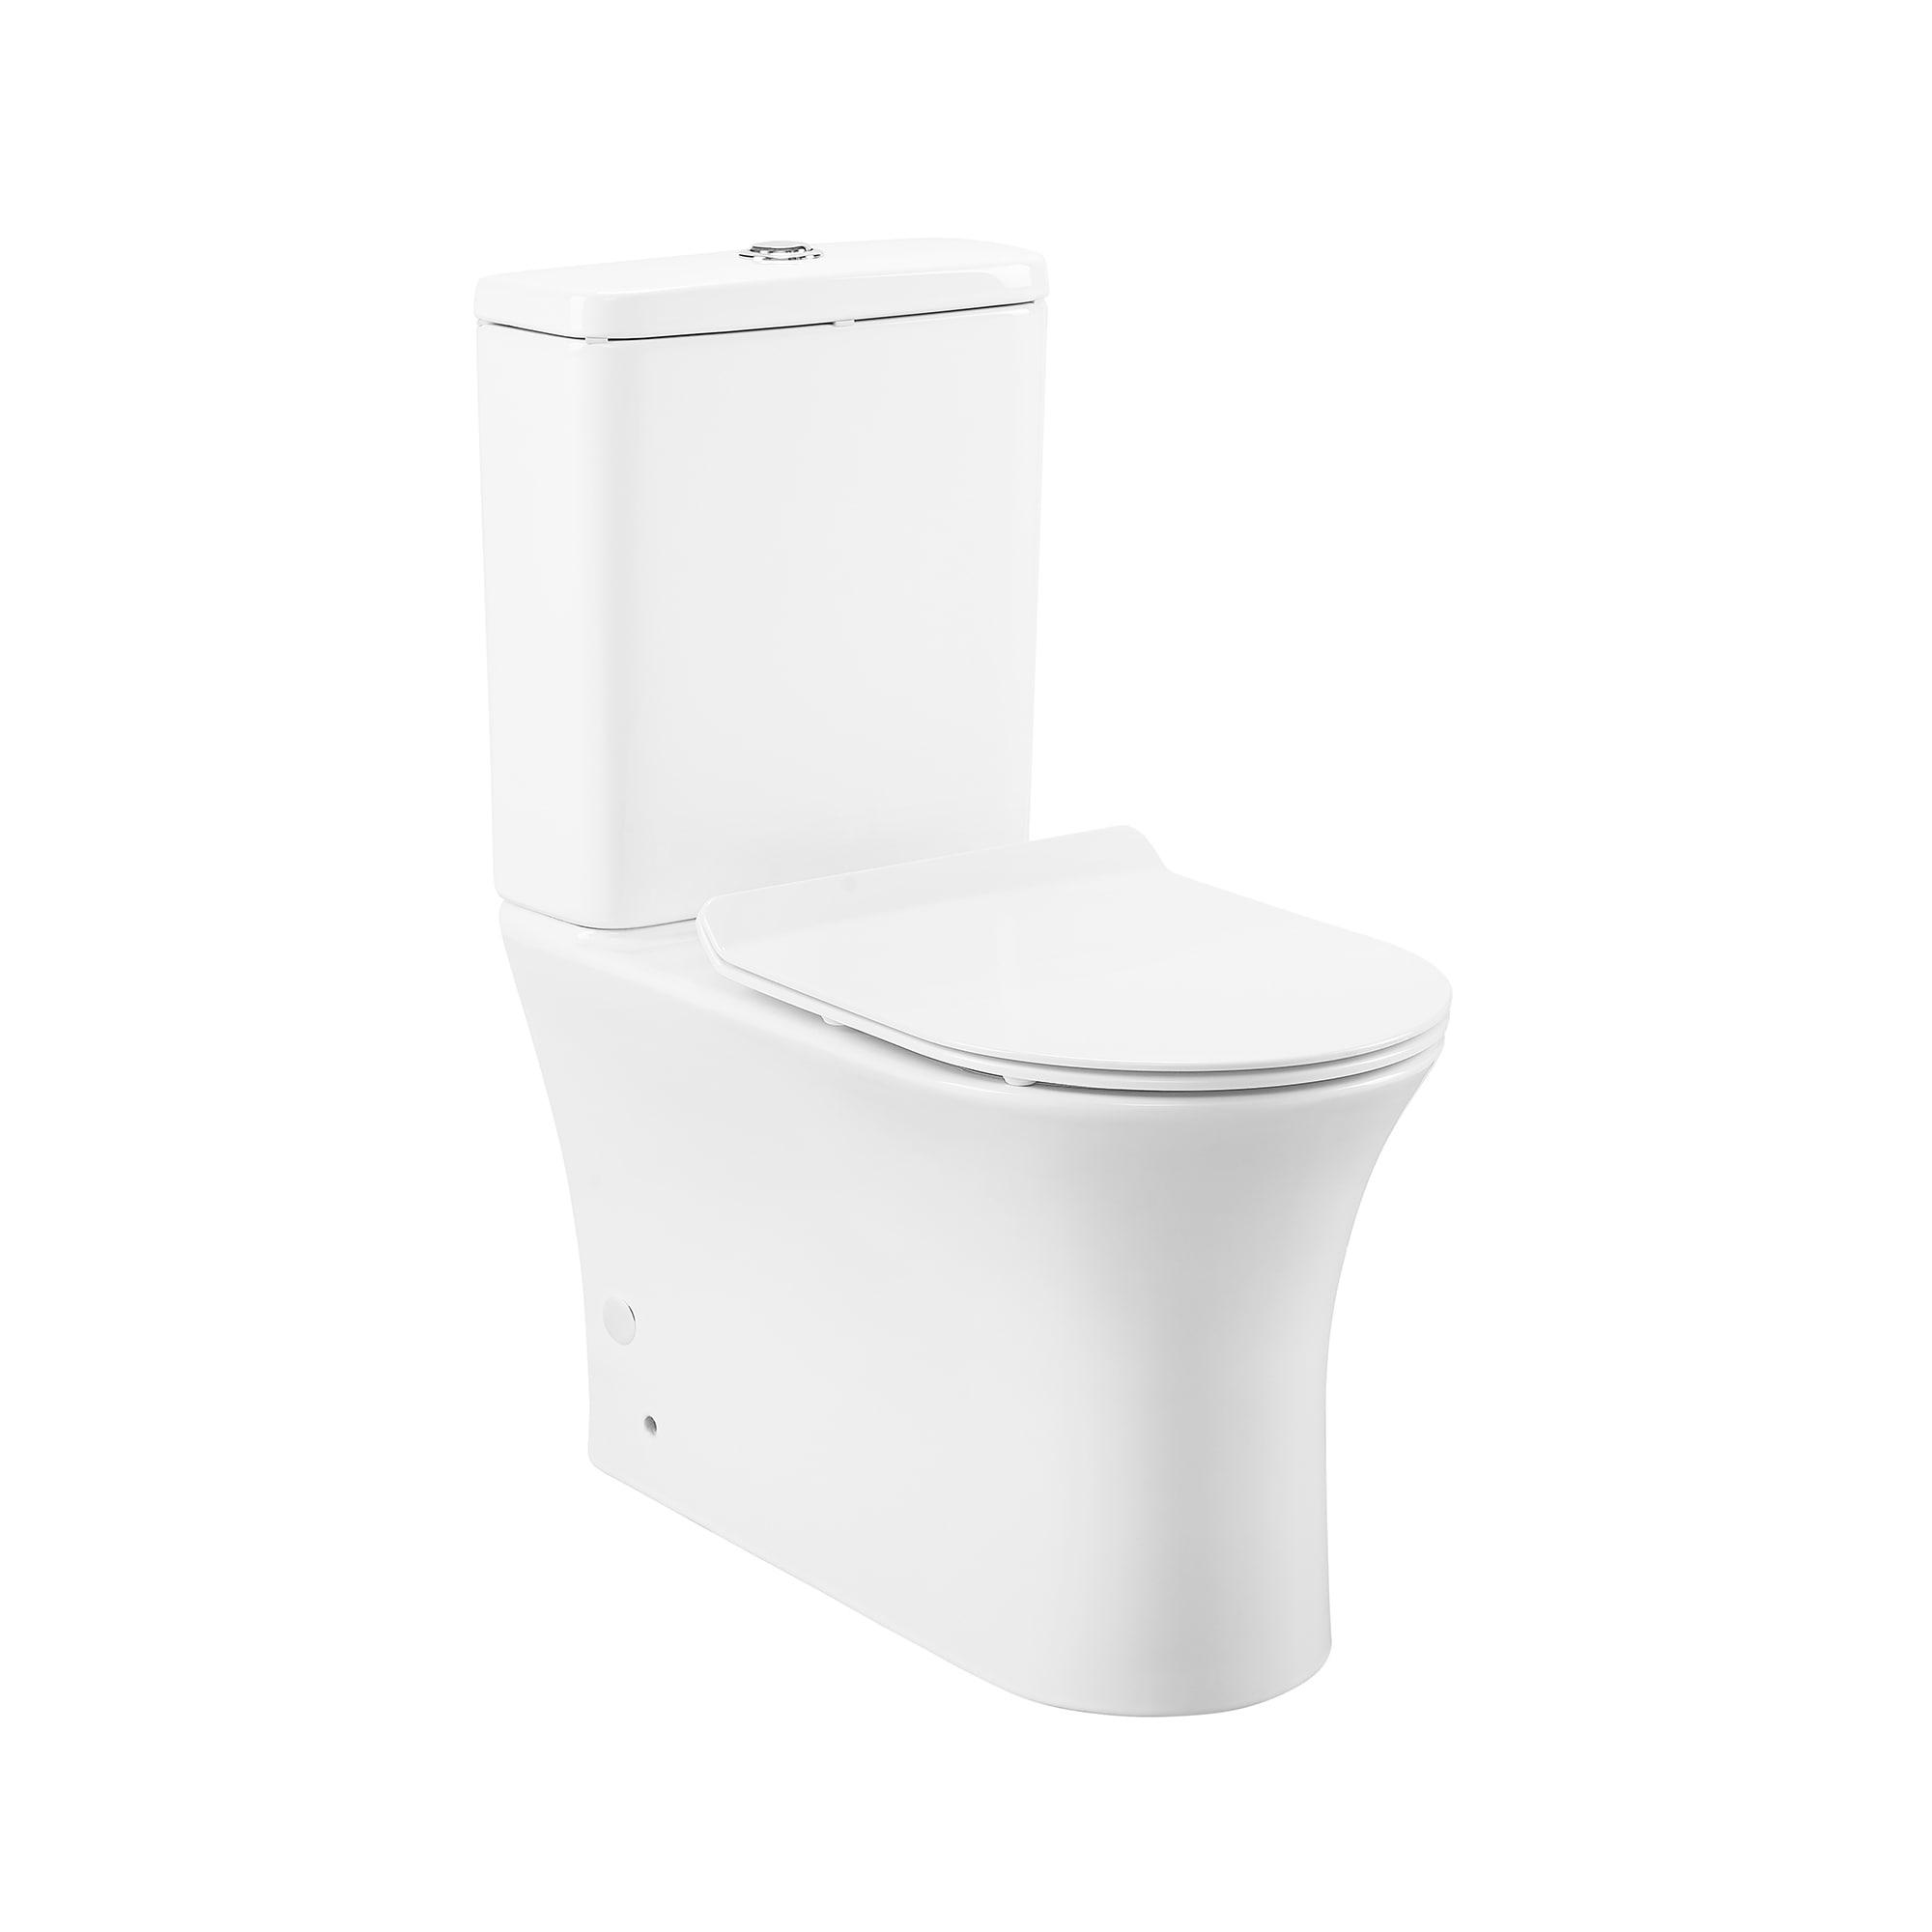 Super Calice Two Piece Elongated Toilet Dual Flush 8 1 28 Gpf N A Dailytribune Chair Design For Home Dailytribuneorg